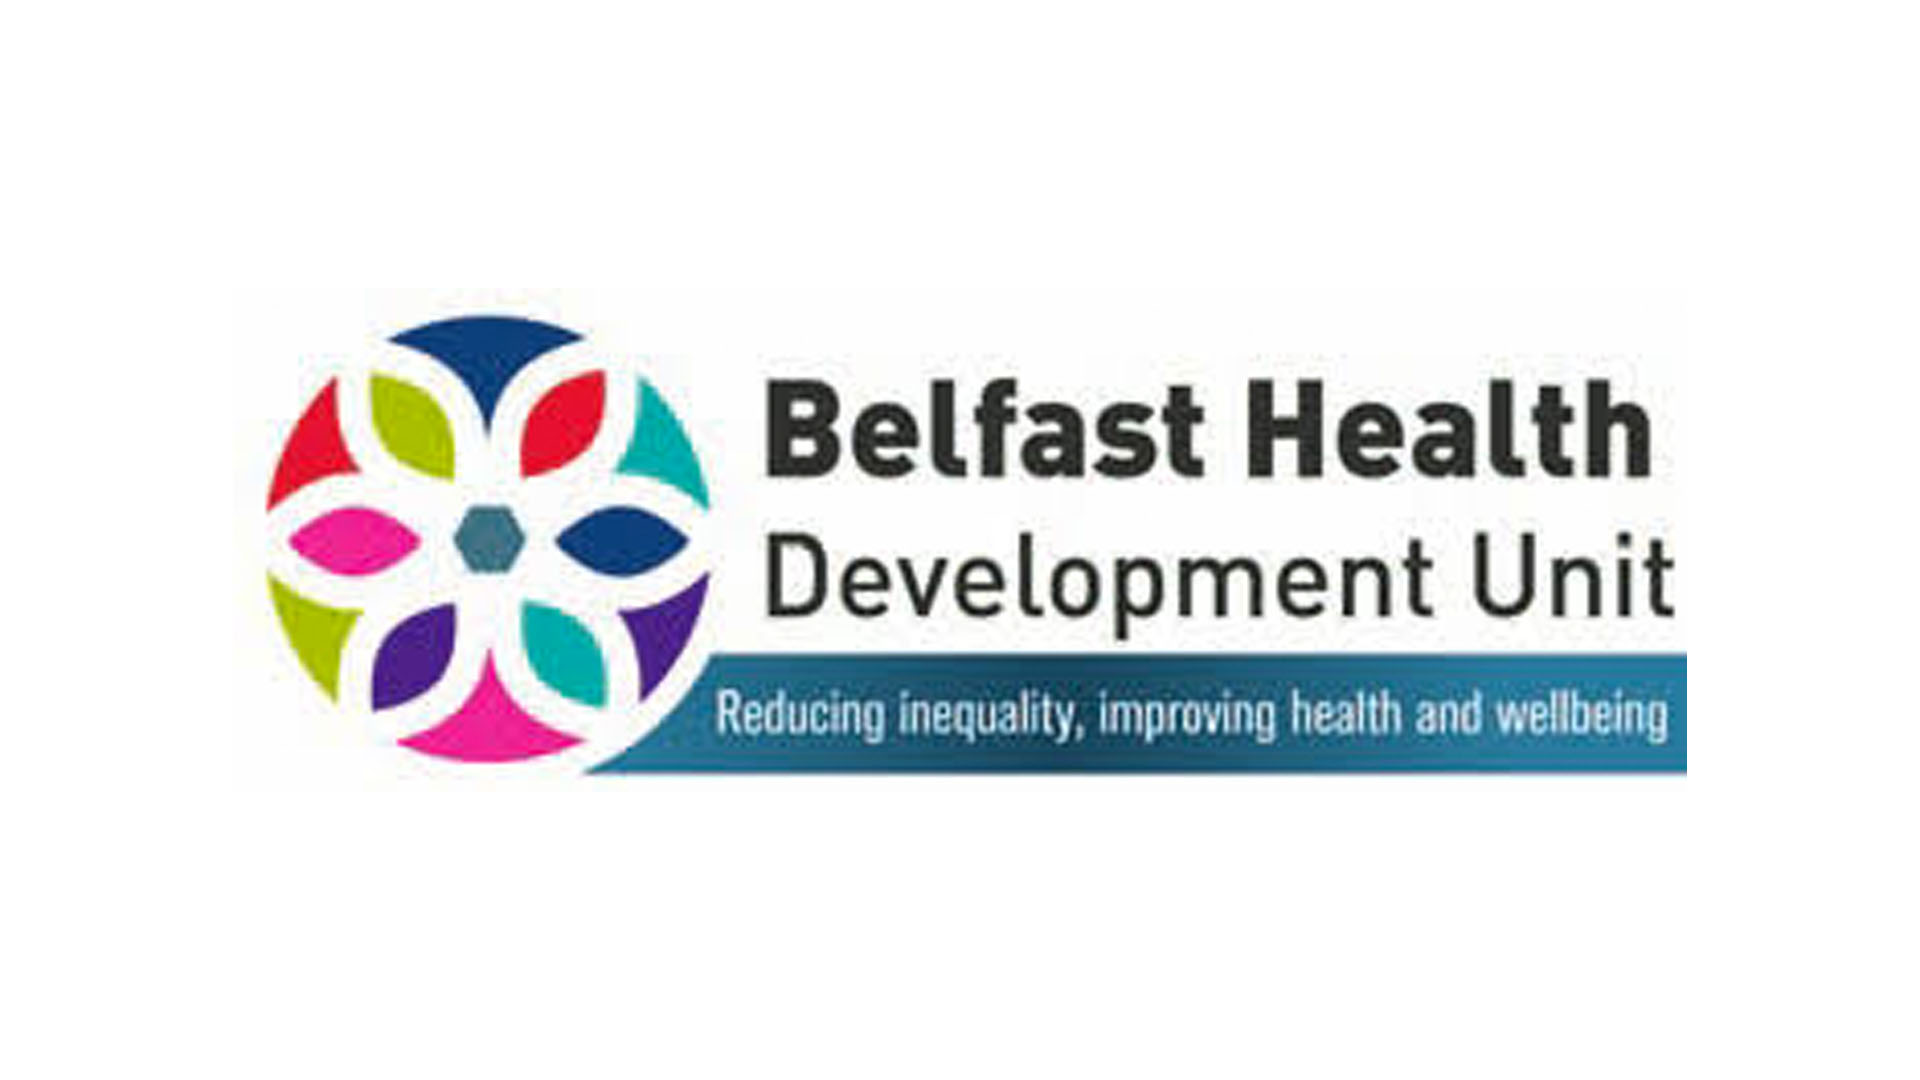 Belfast Health Development Unit